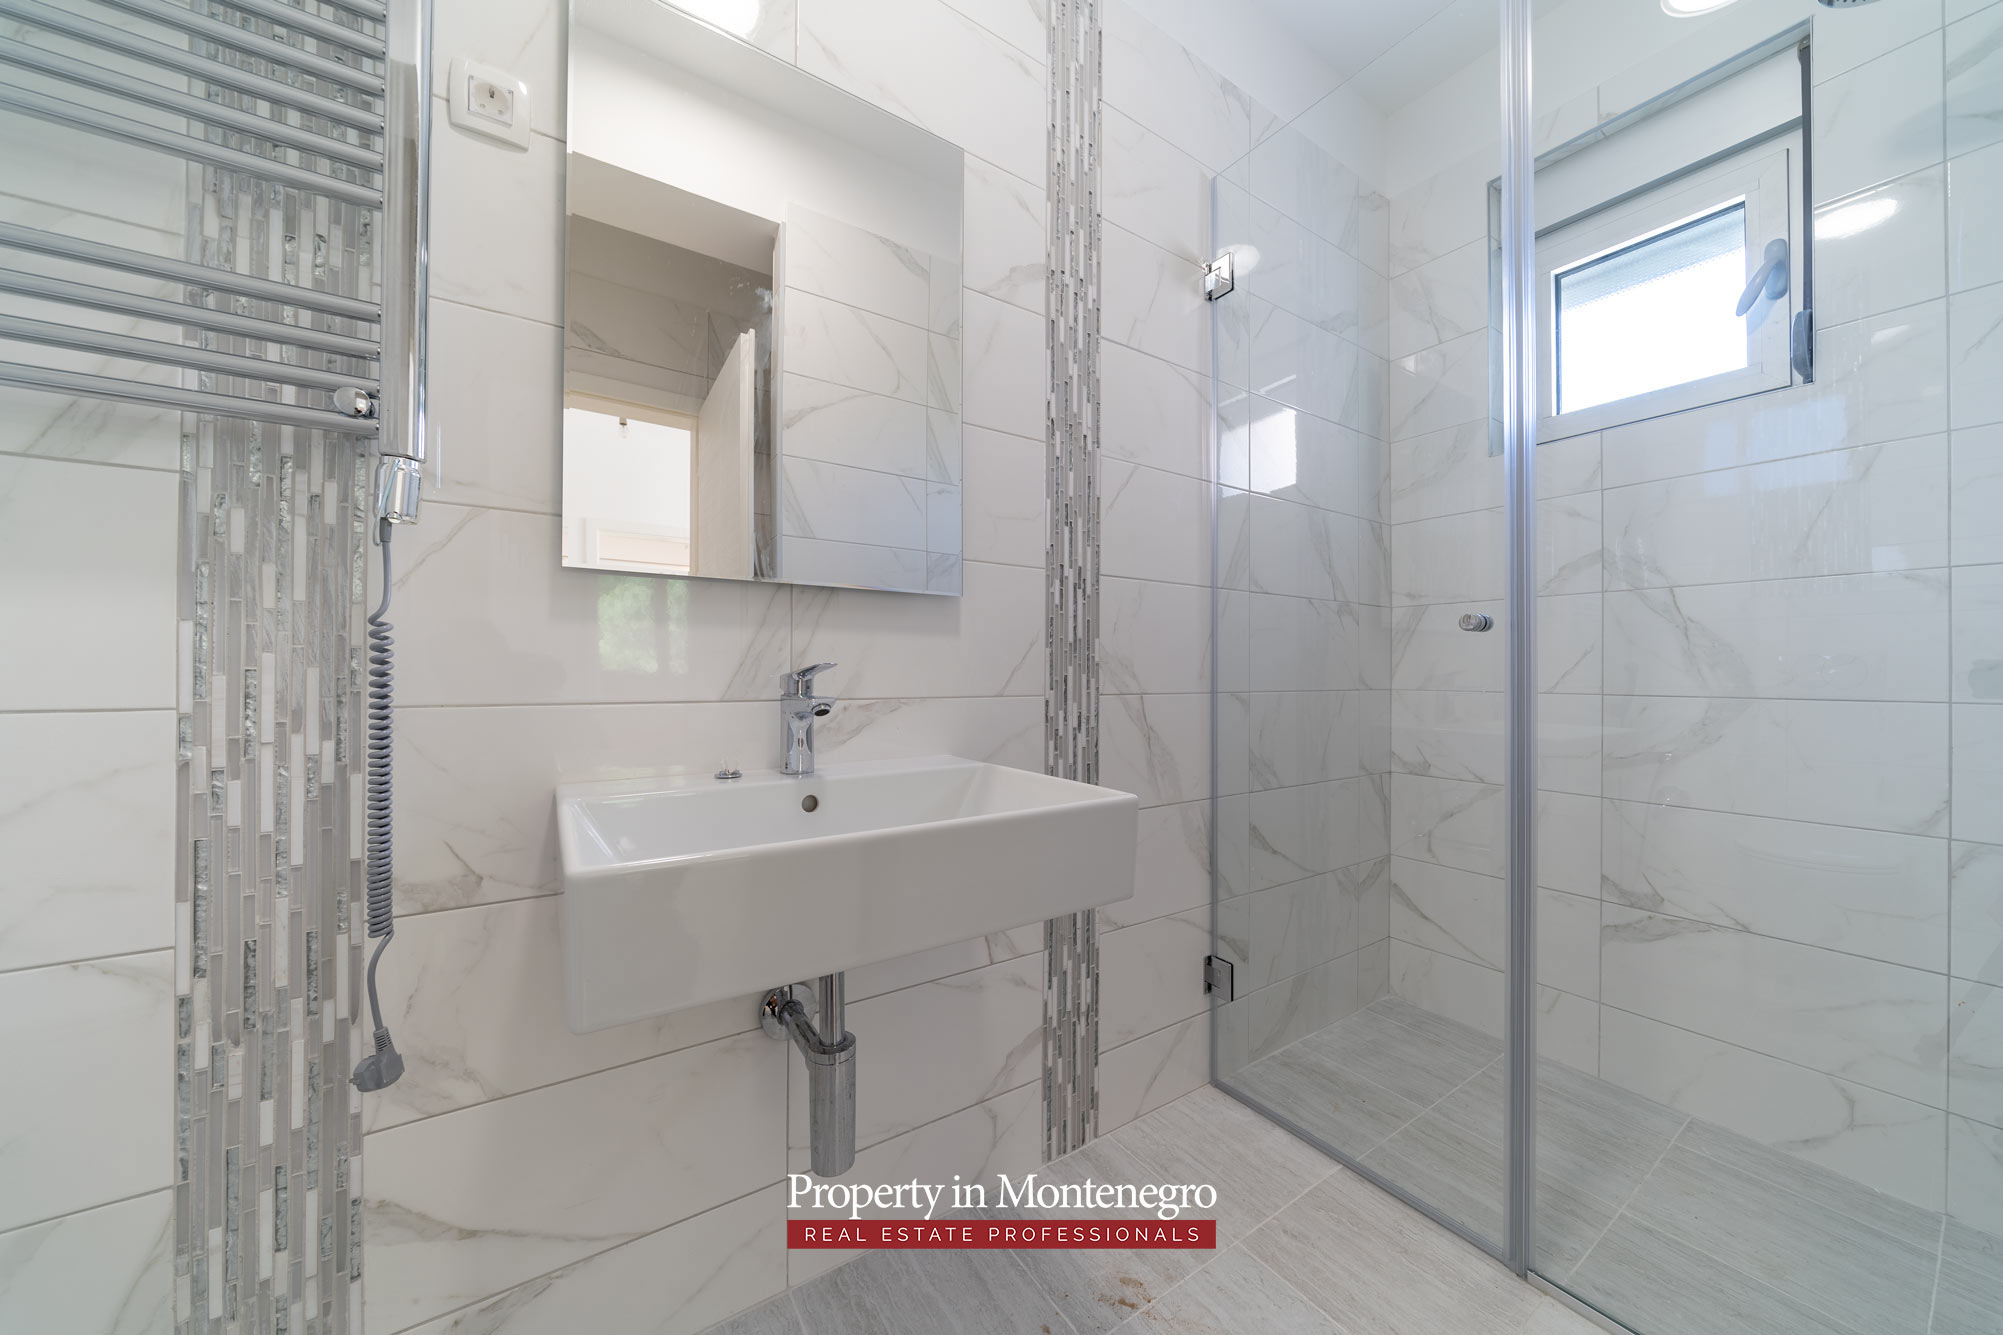 One Bedroom Apartment Near Kotor Prodaja Nekretnina Crna Gora